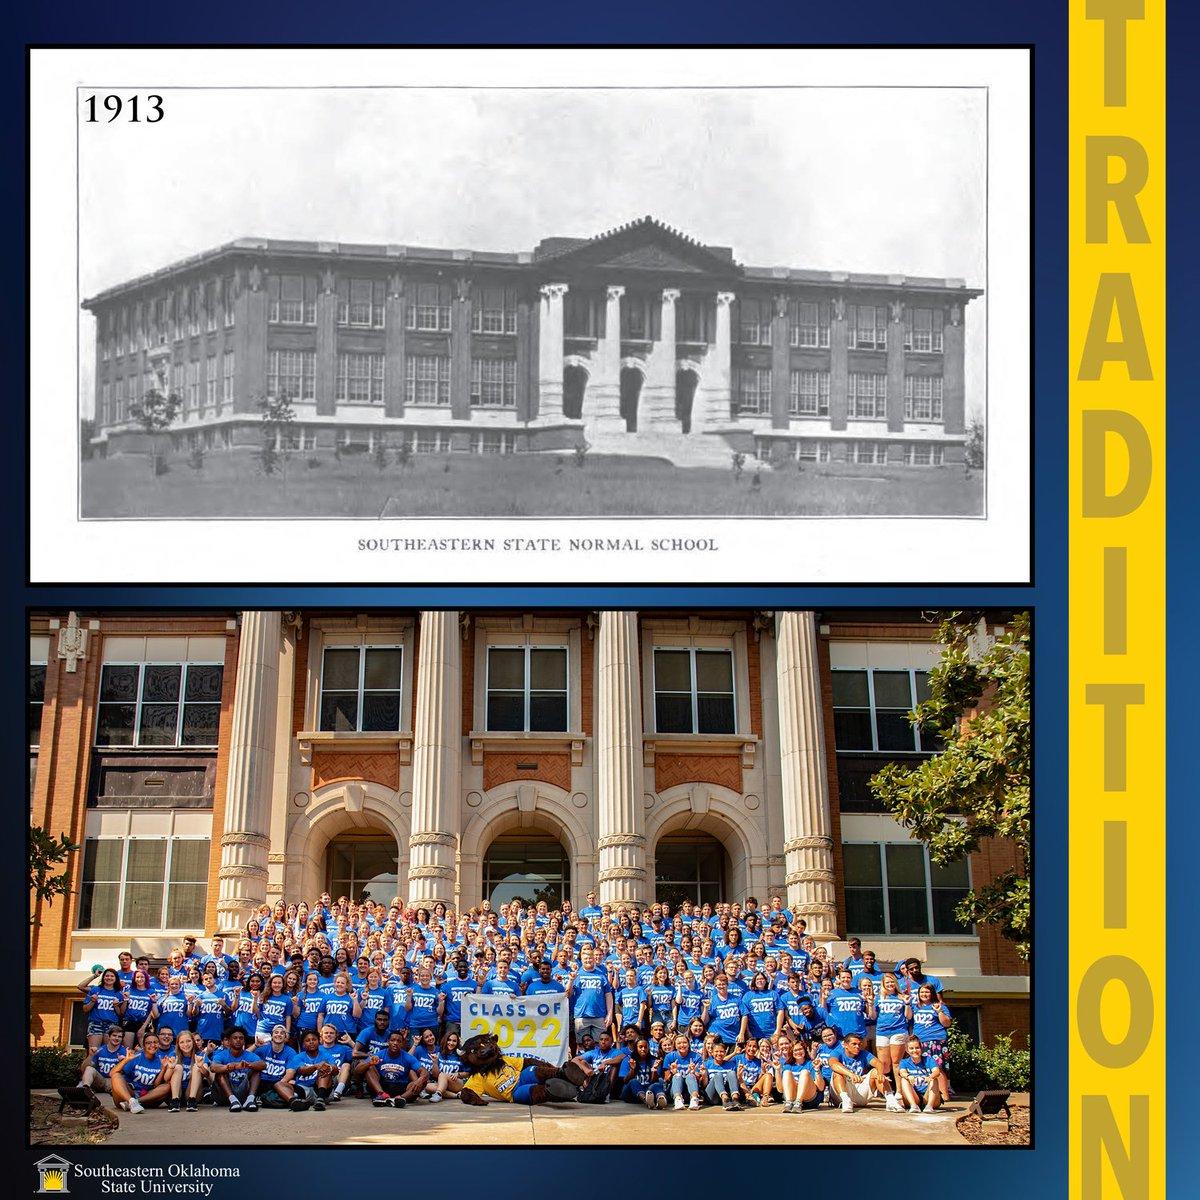 Southeastern Oklahoma State University >> Southeastern Oklahoma State University Twitterissa